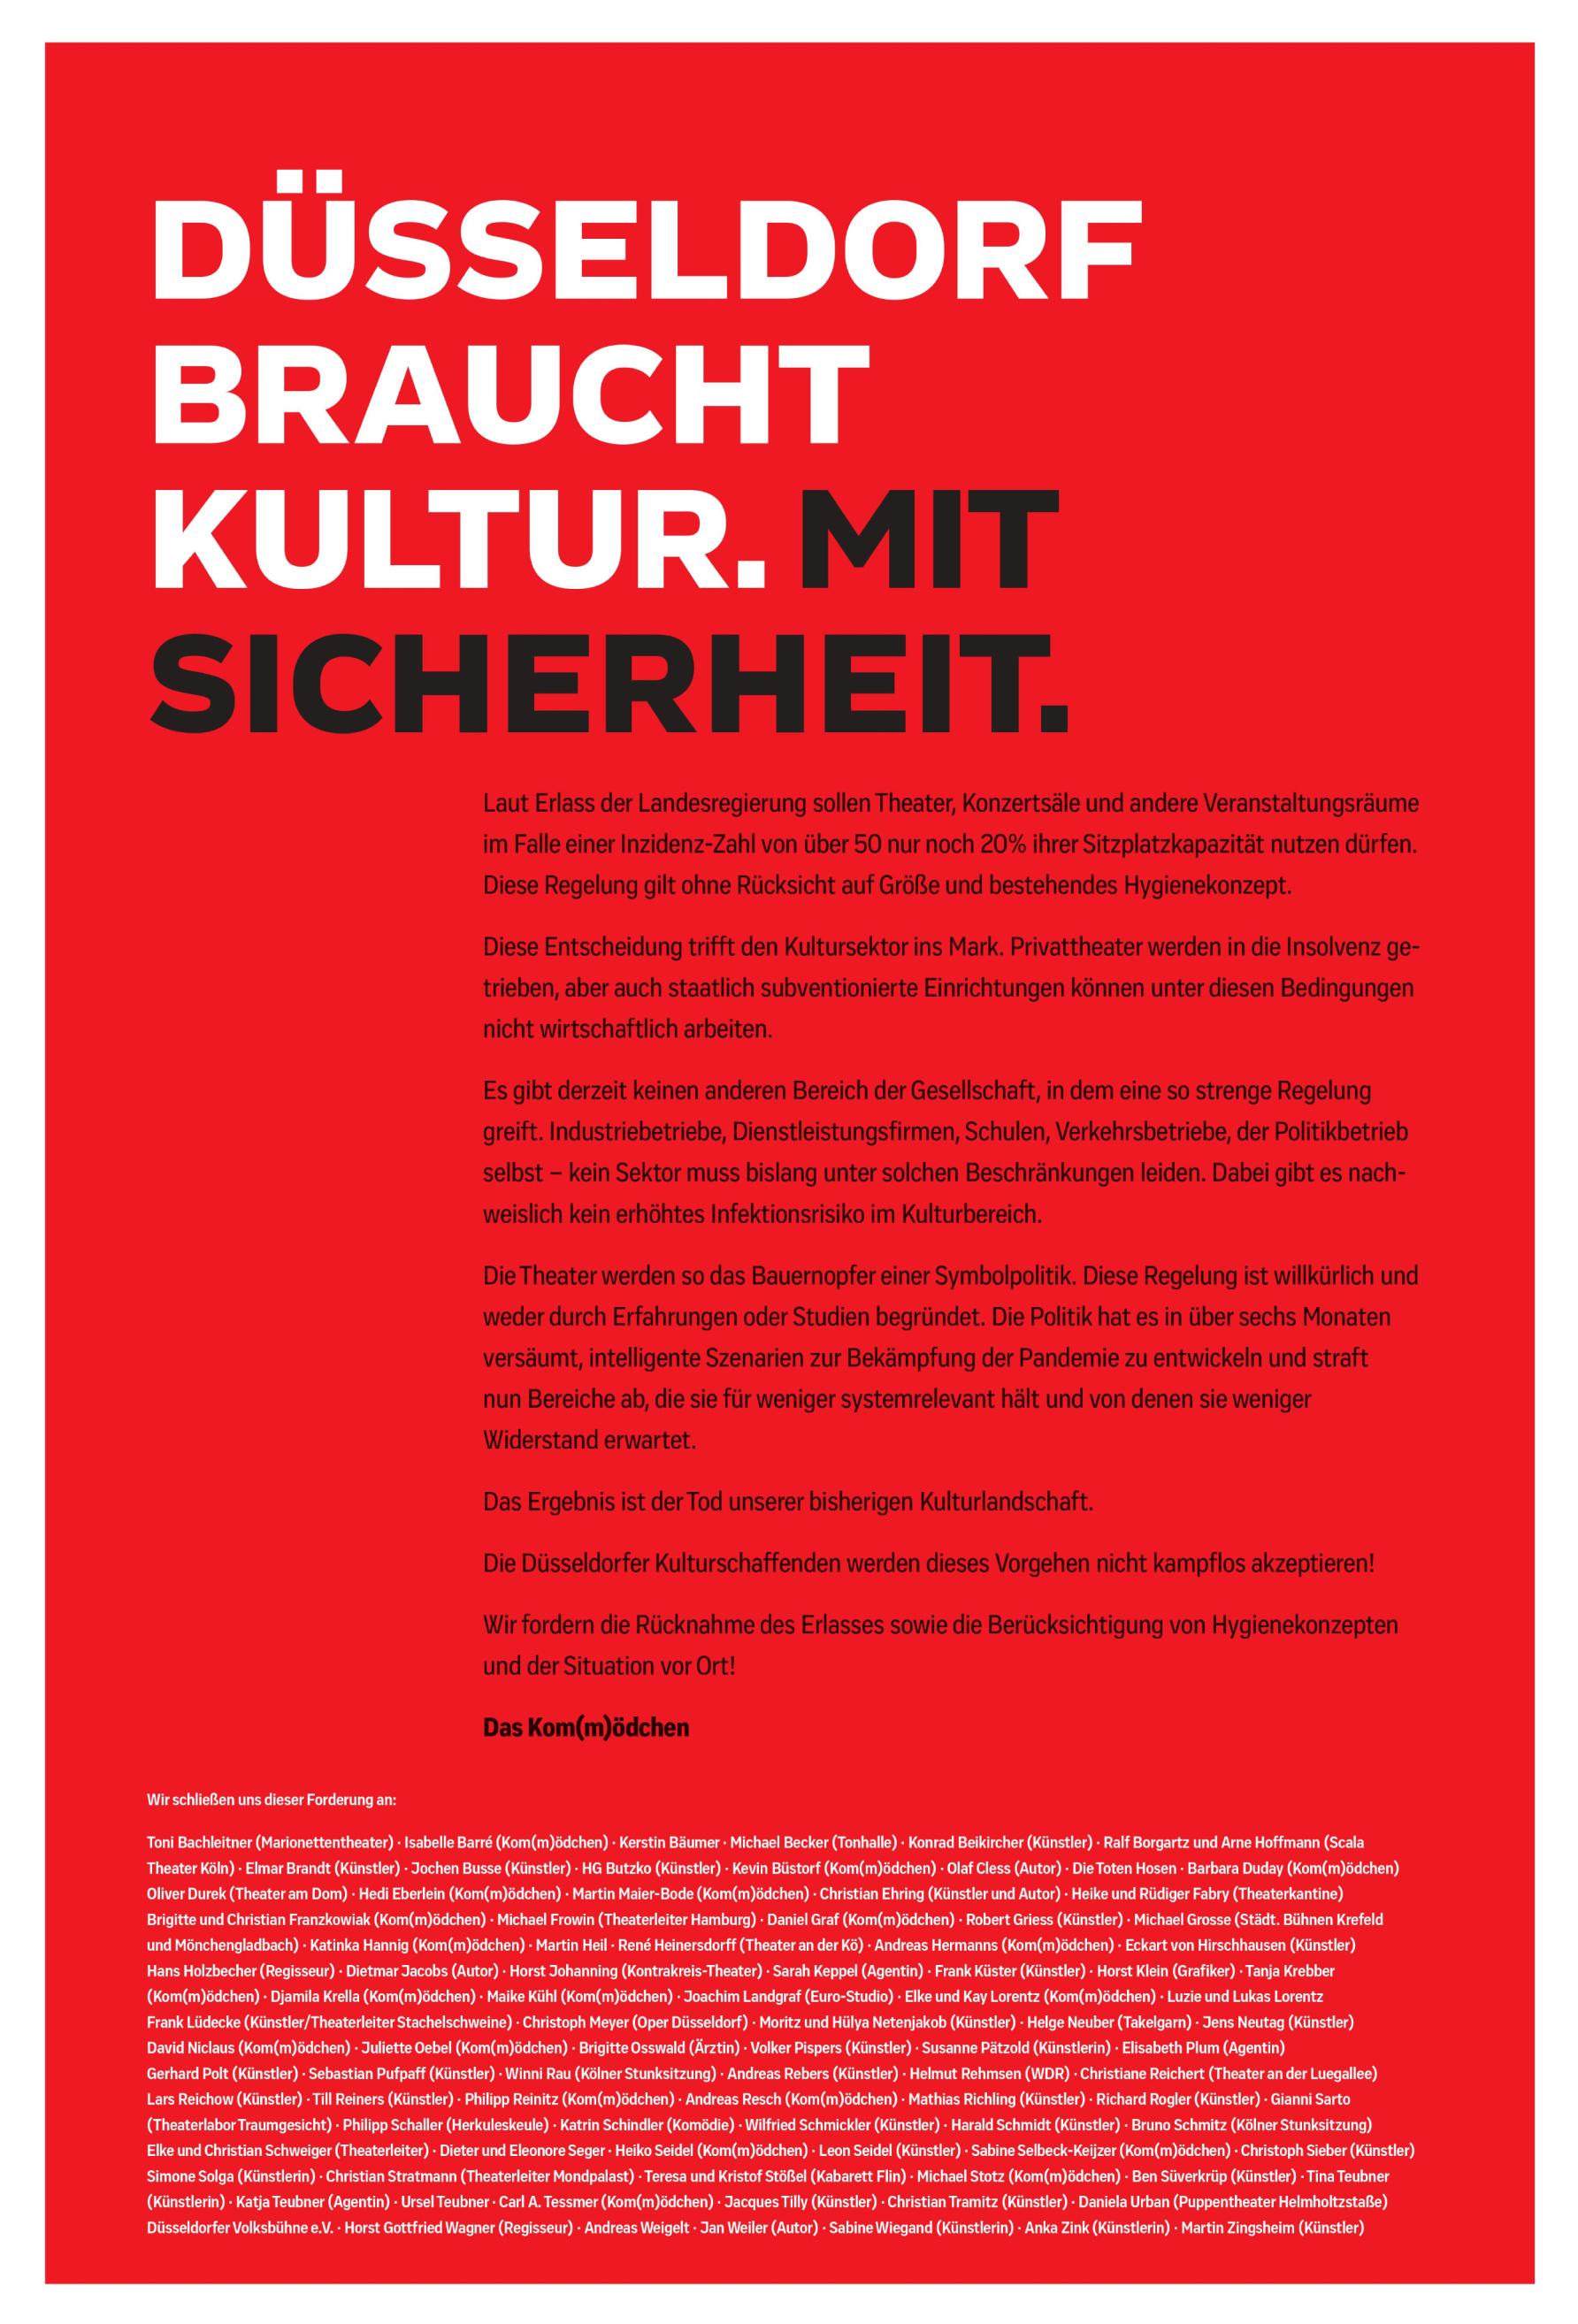 Düsseldorf braucht Kultur